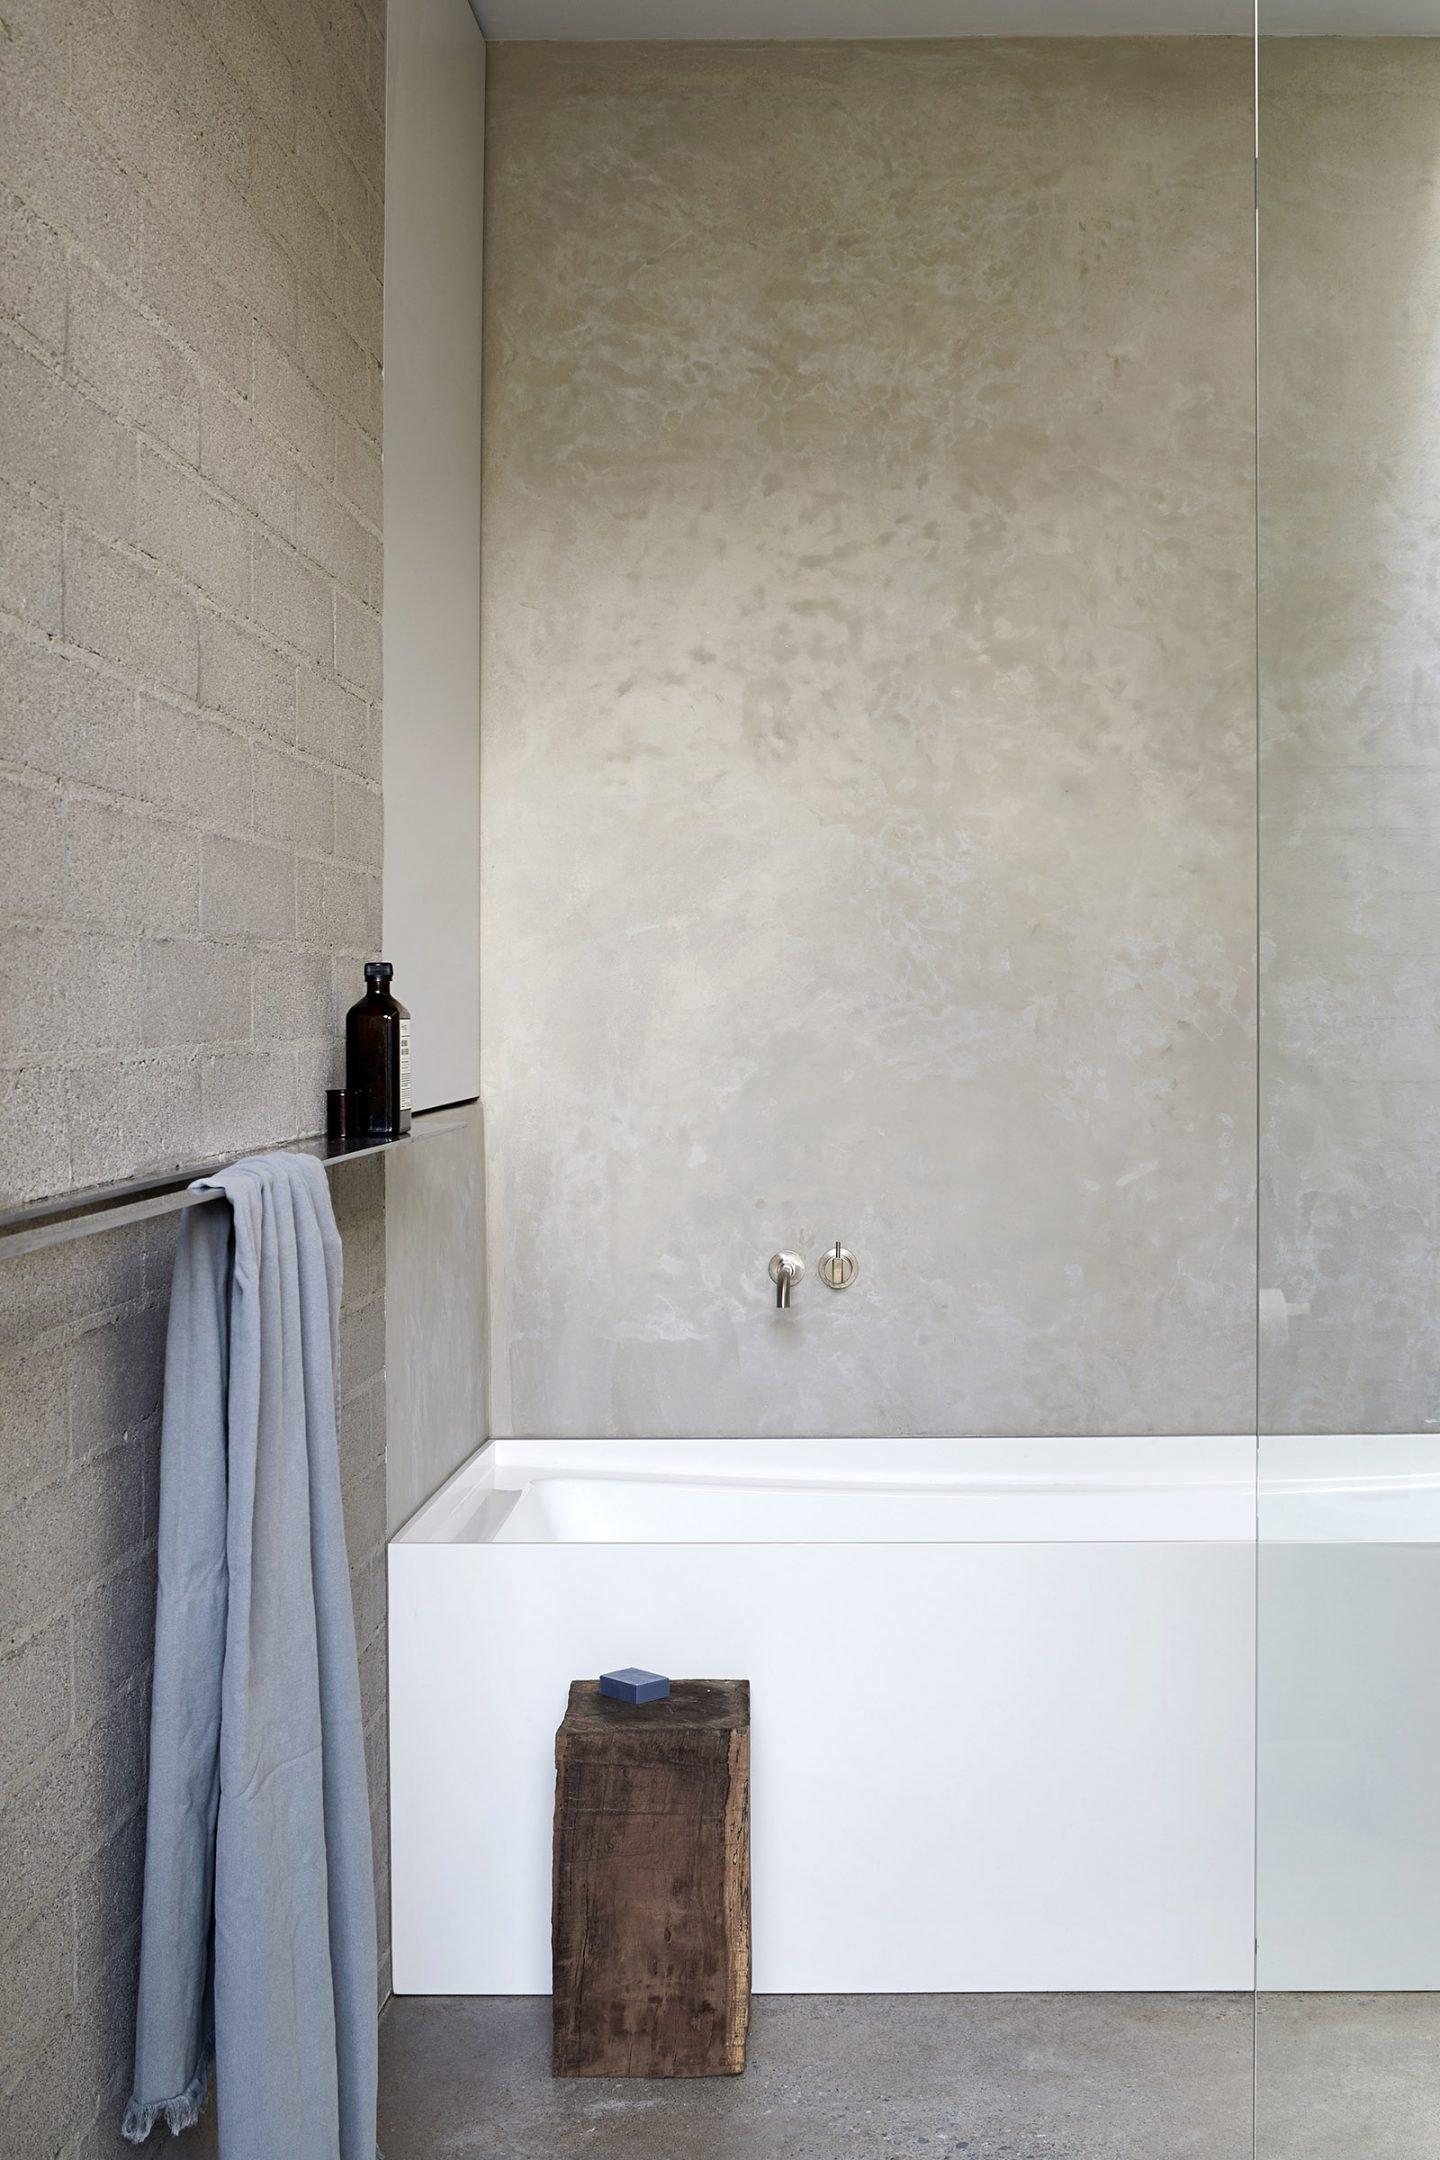 IGNANT-Architecture-studiofour-ruxton-rise-02